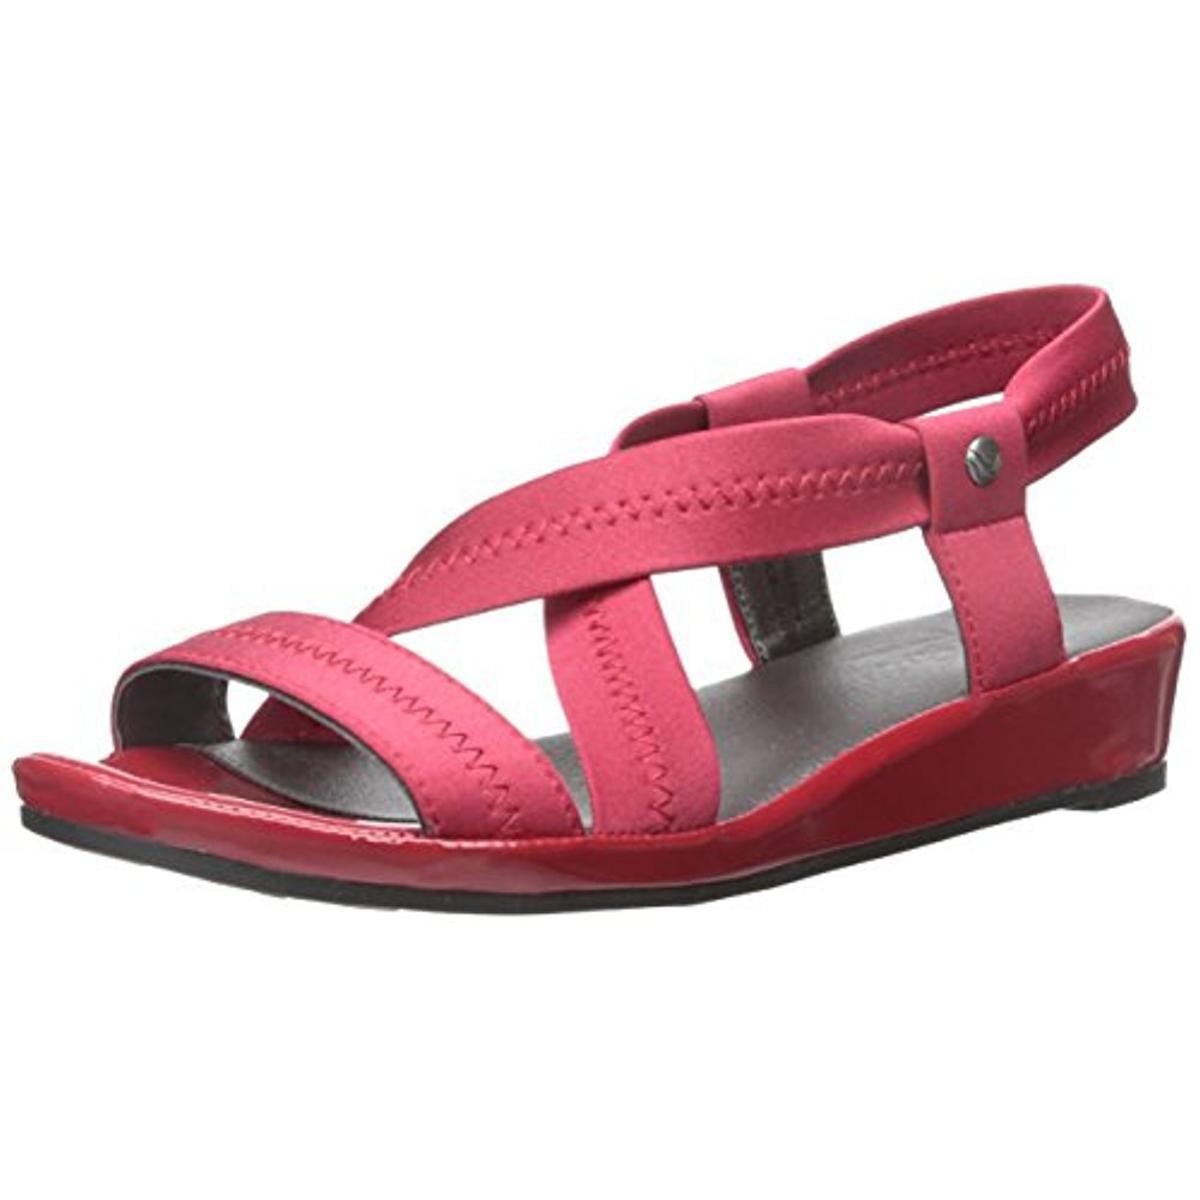 Lifestride Womens Debutante Stretch Slingback Sandals by LifeStride